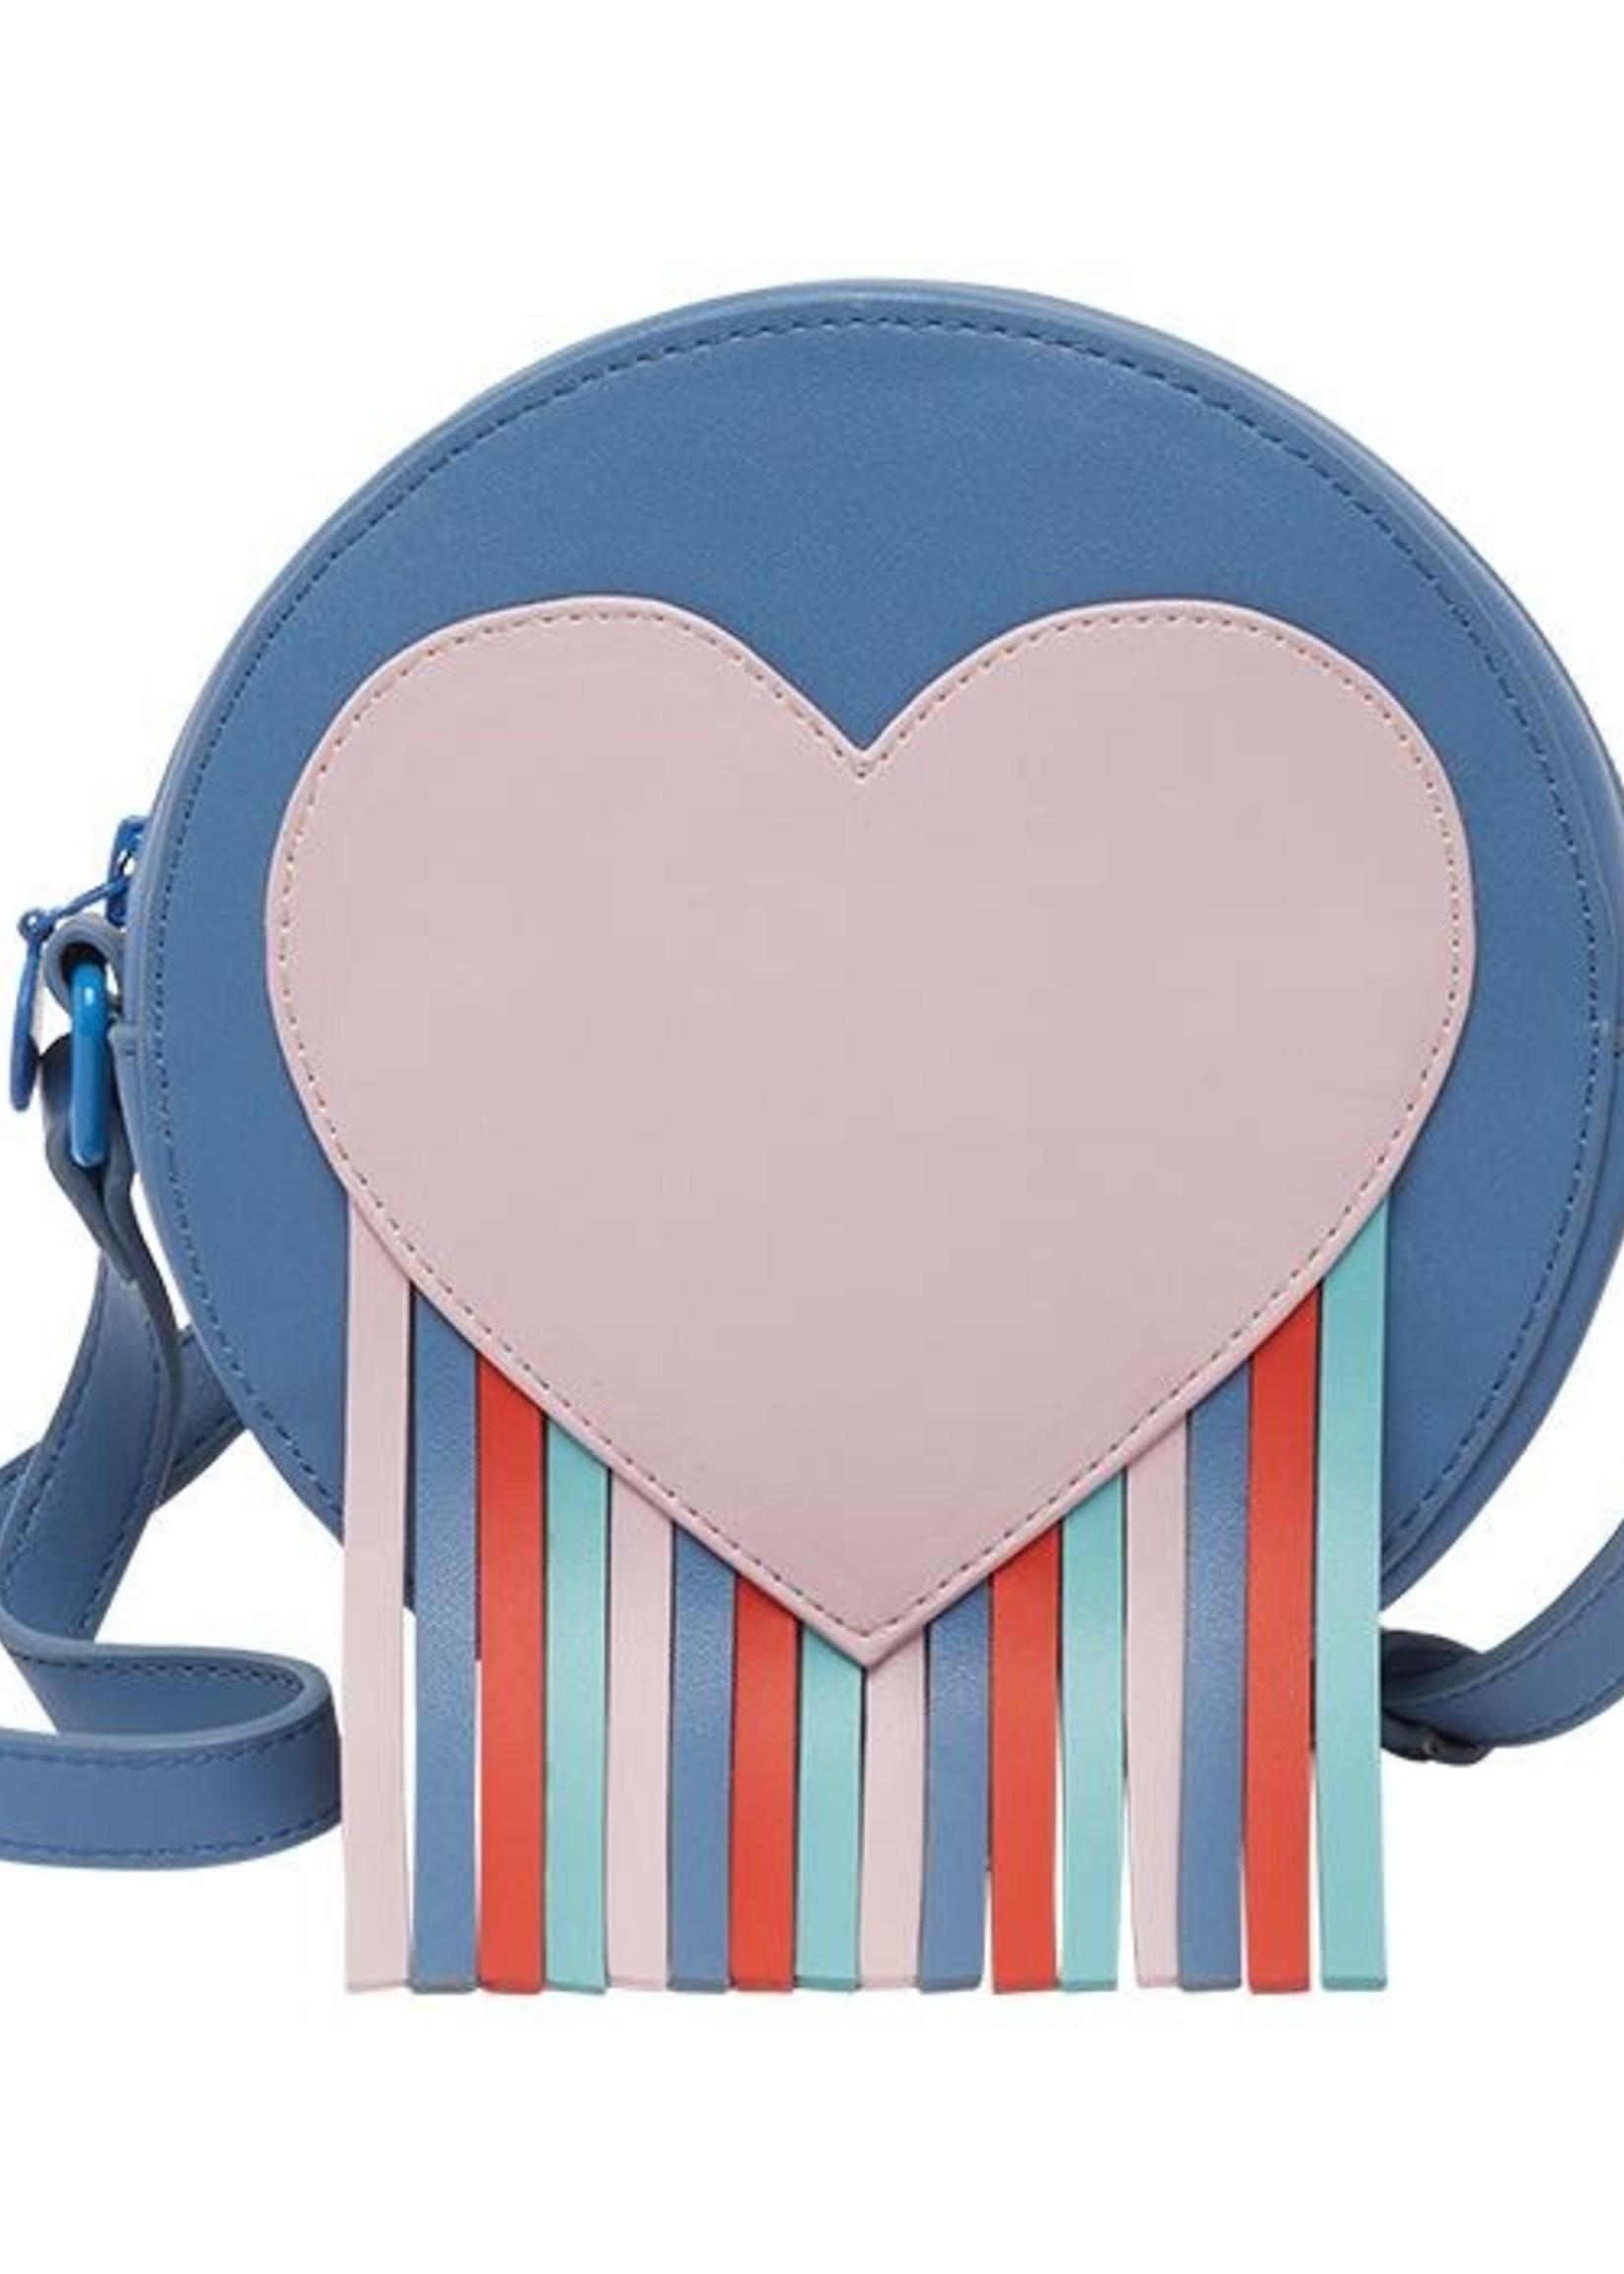 Stella McCartney Stella McCartney-AW21 603414 BAG